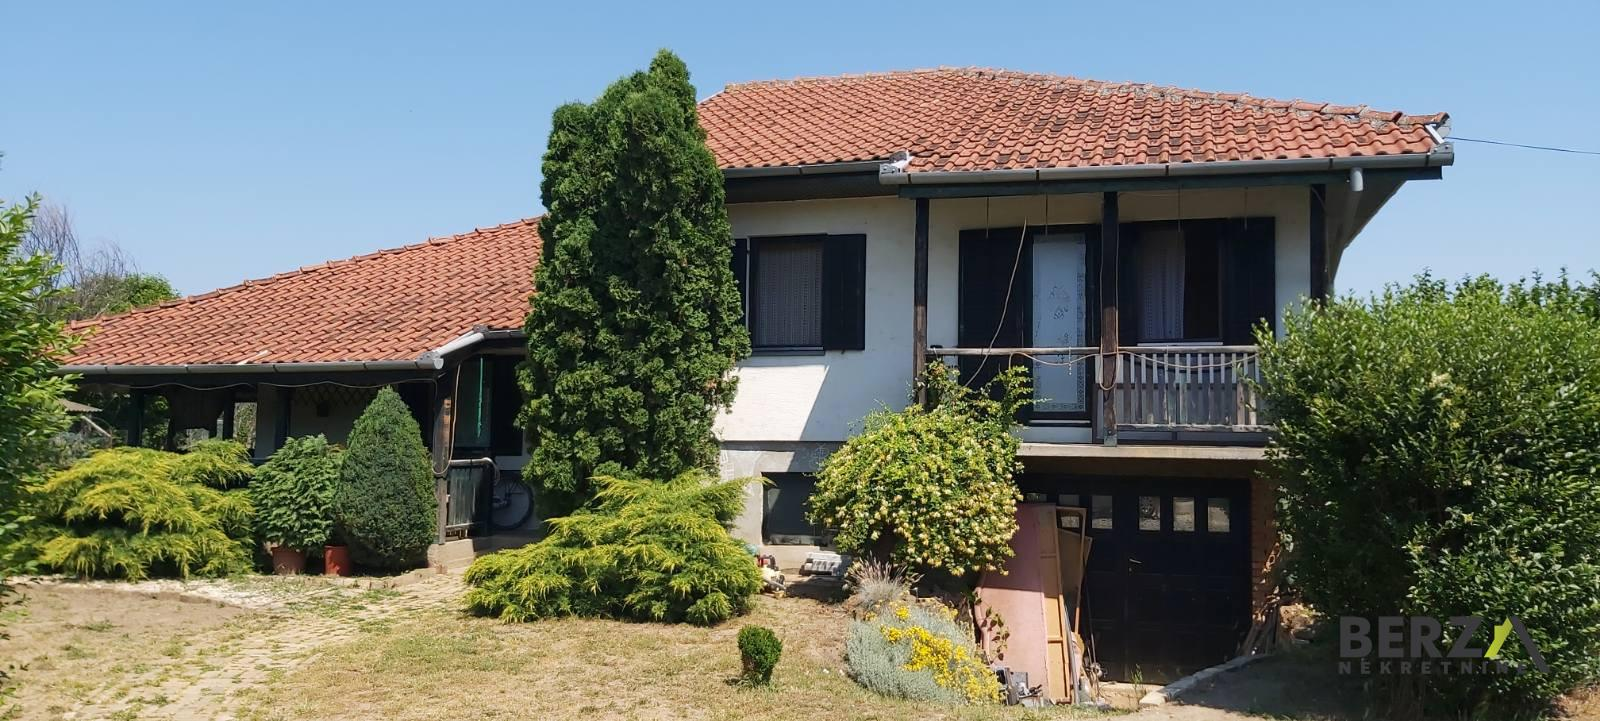 kuća - RUMENKA - CENTAR - 3000133